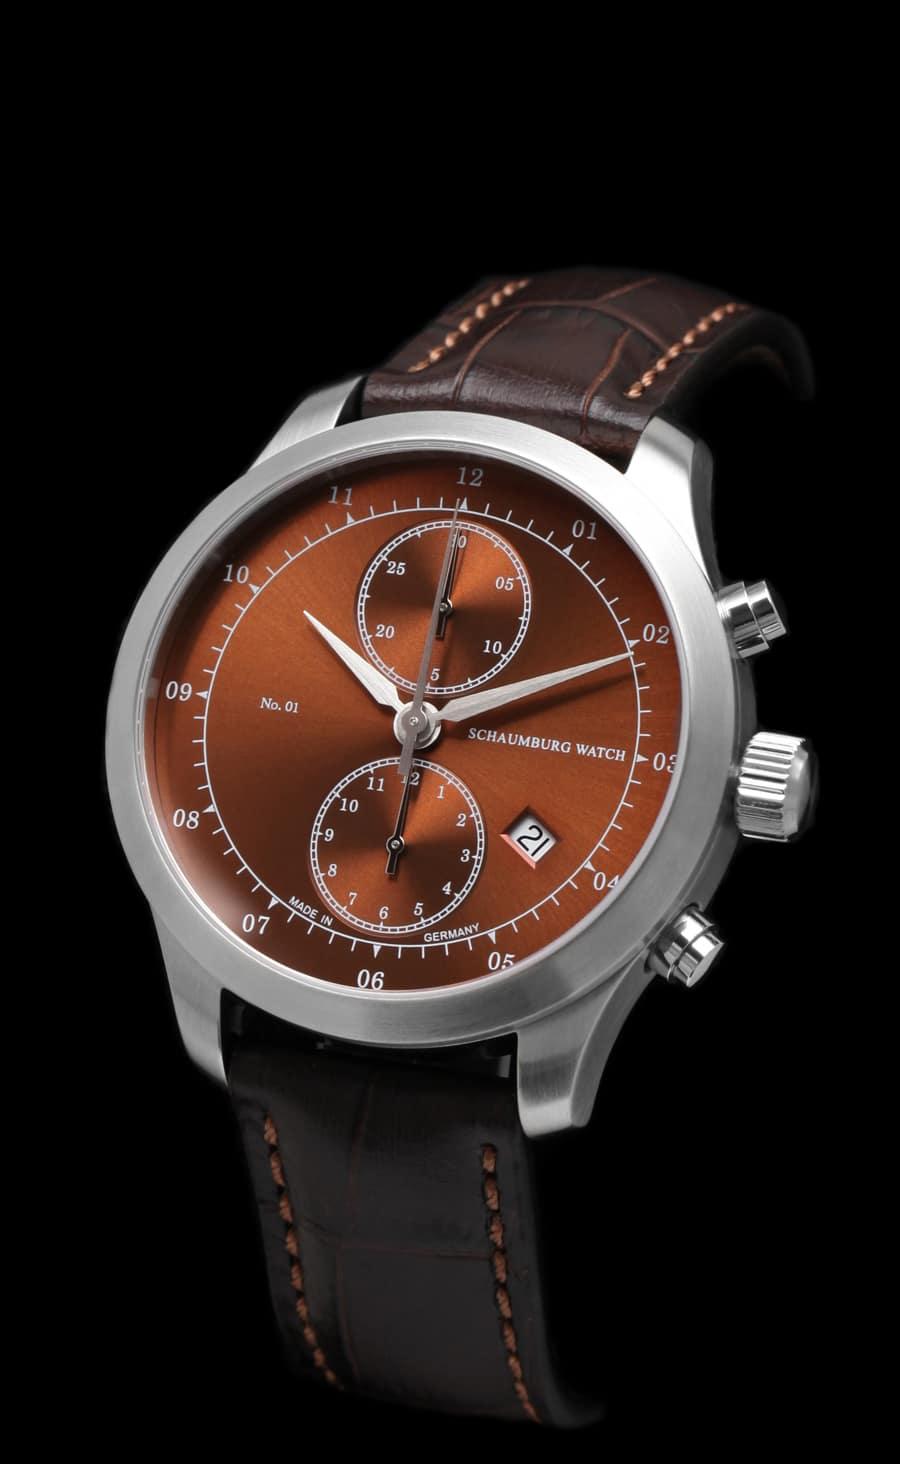 Schaumburg Watch: Chronograph No.01, braunes Zifferblatt